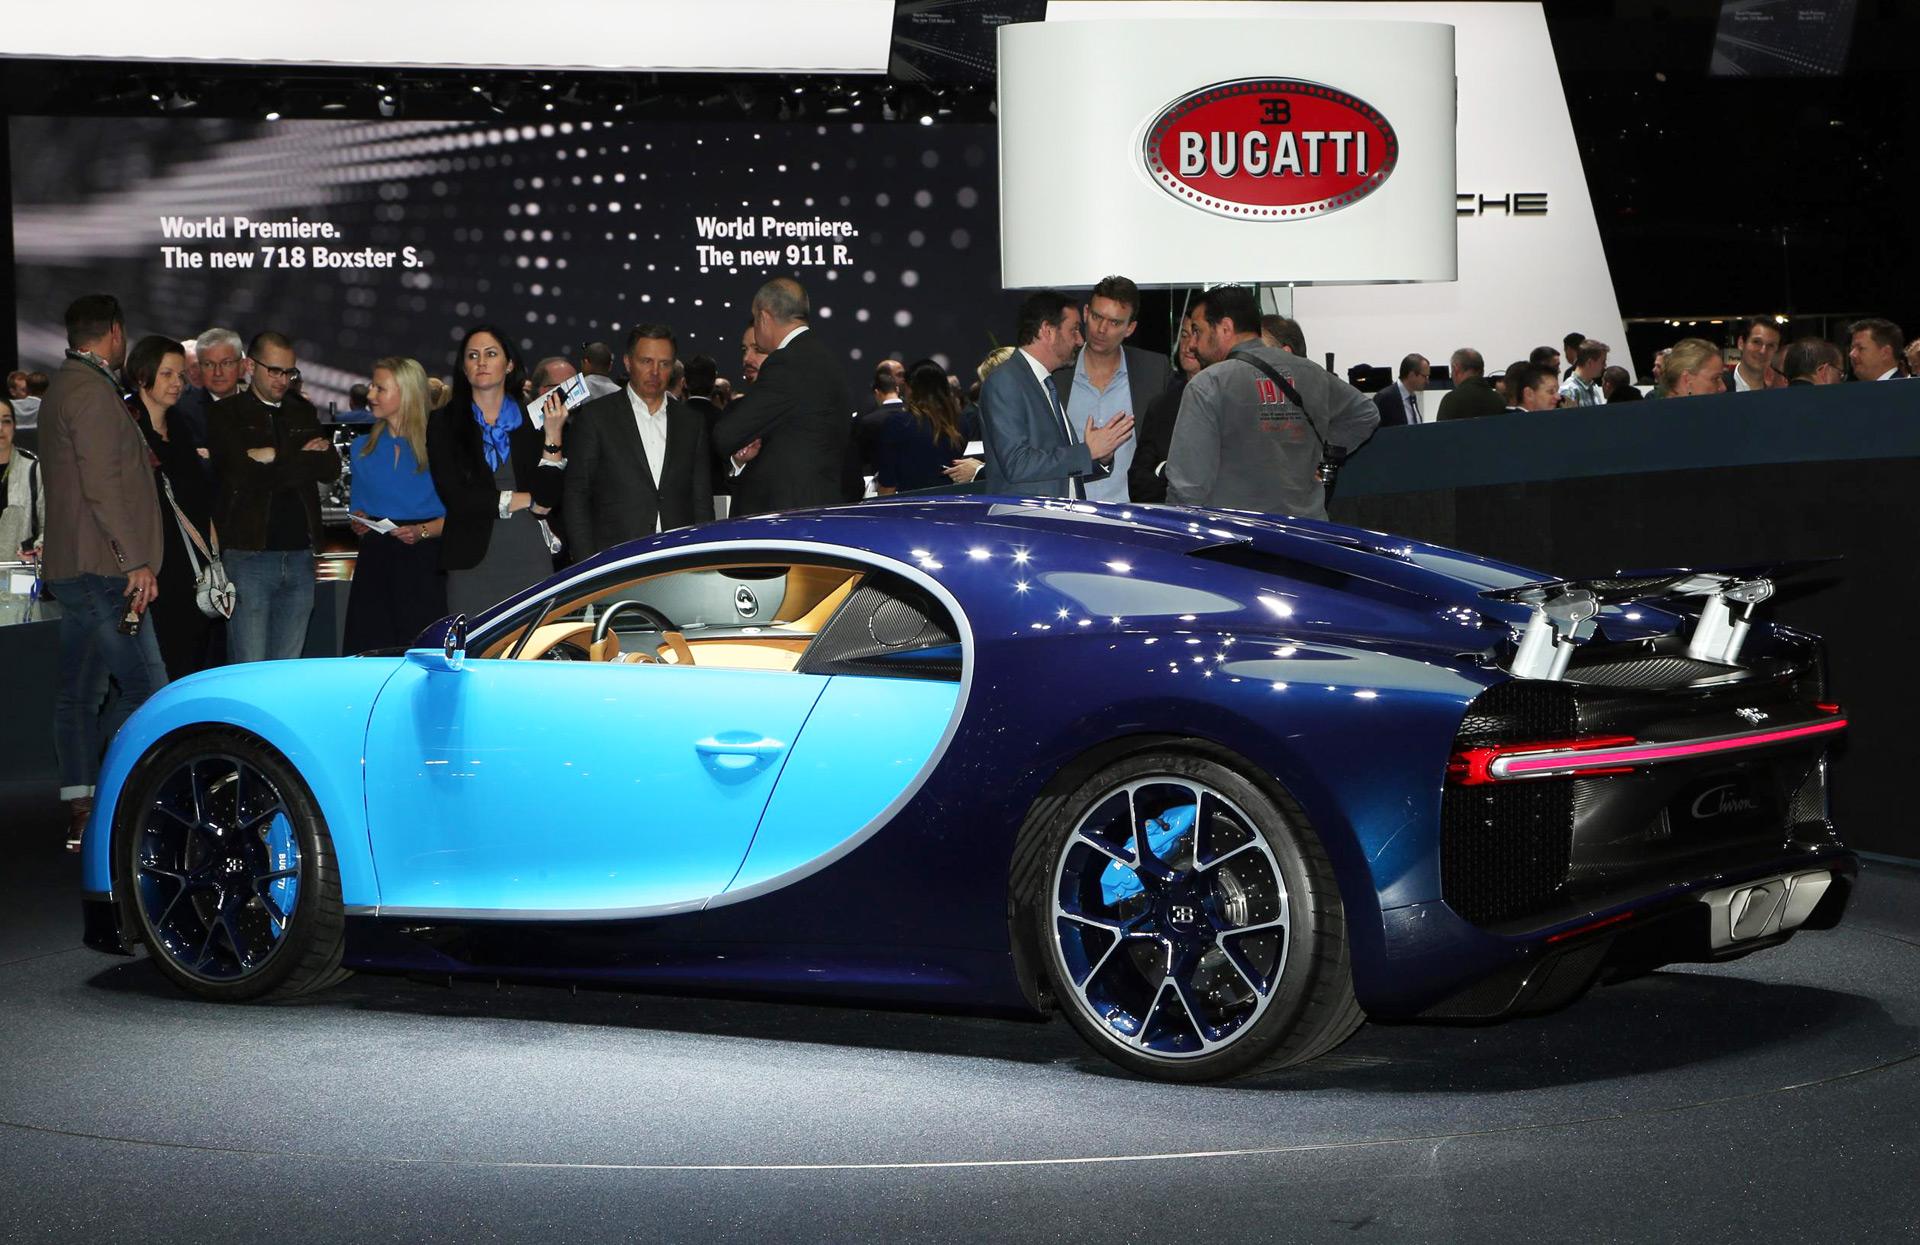 Bugatti Chiron Engine Audi Sq7 Tdi Kahn Vengeance Car